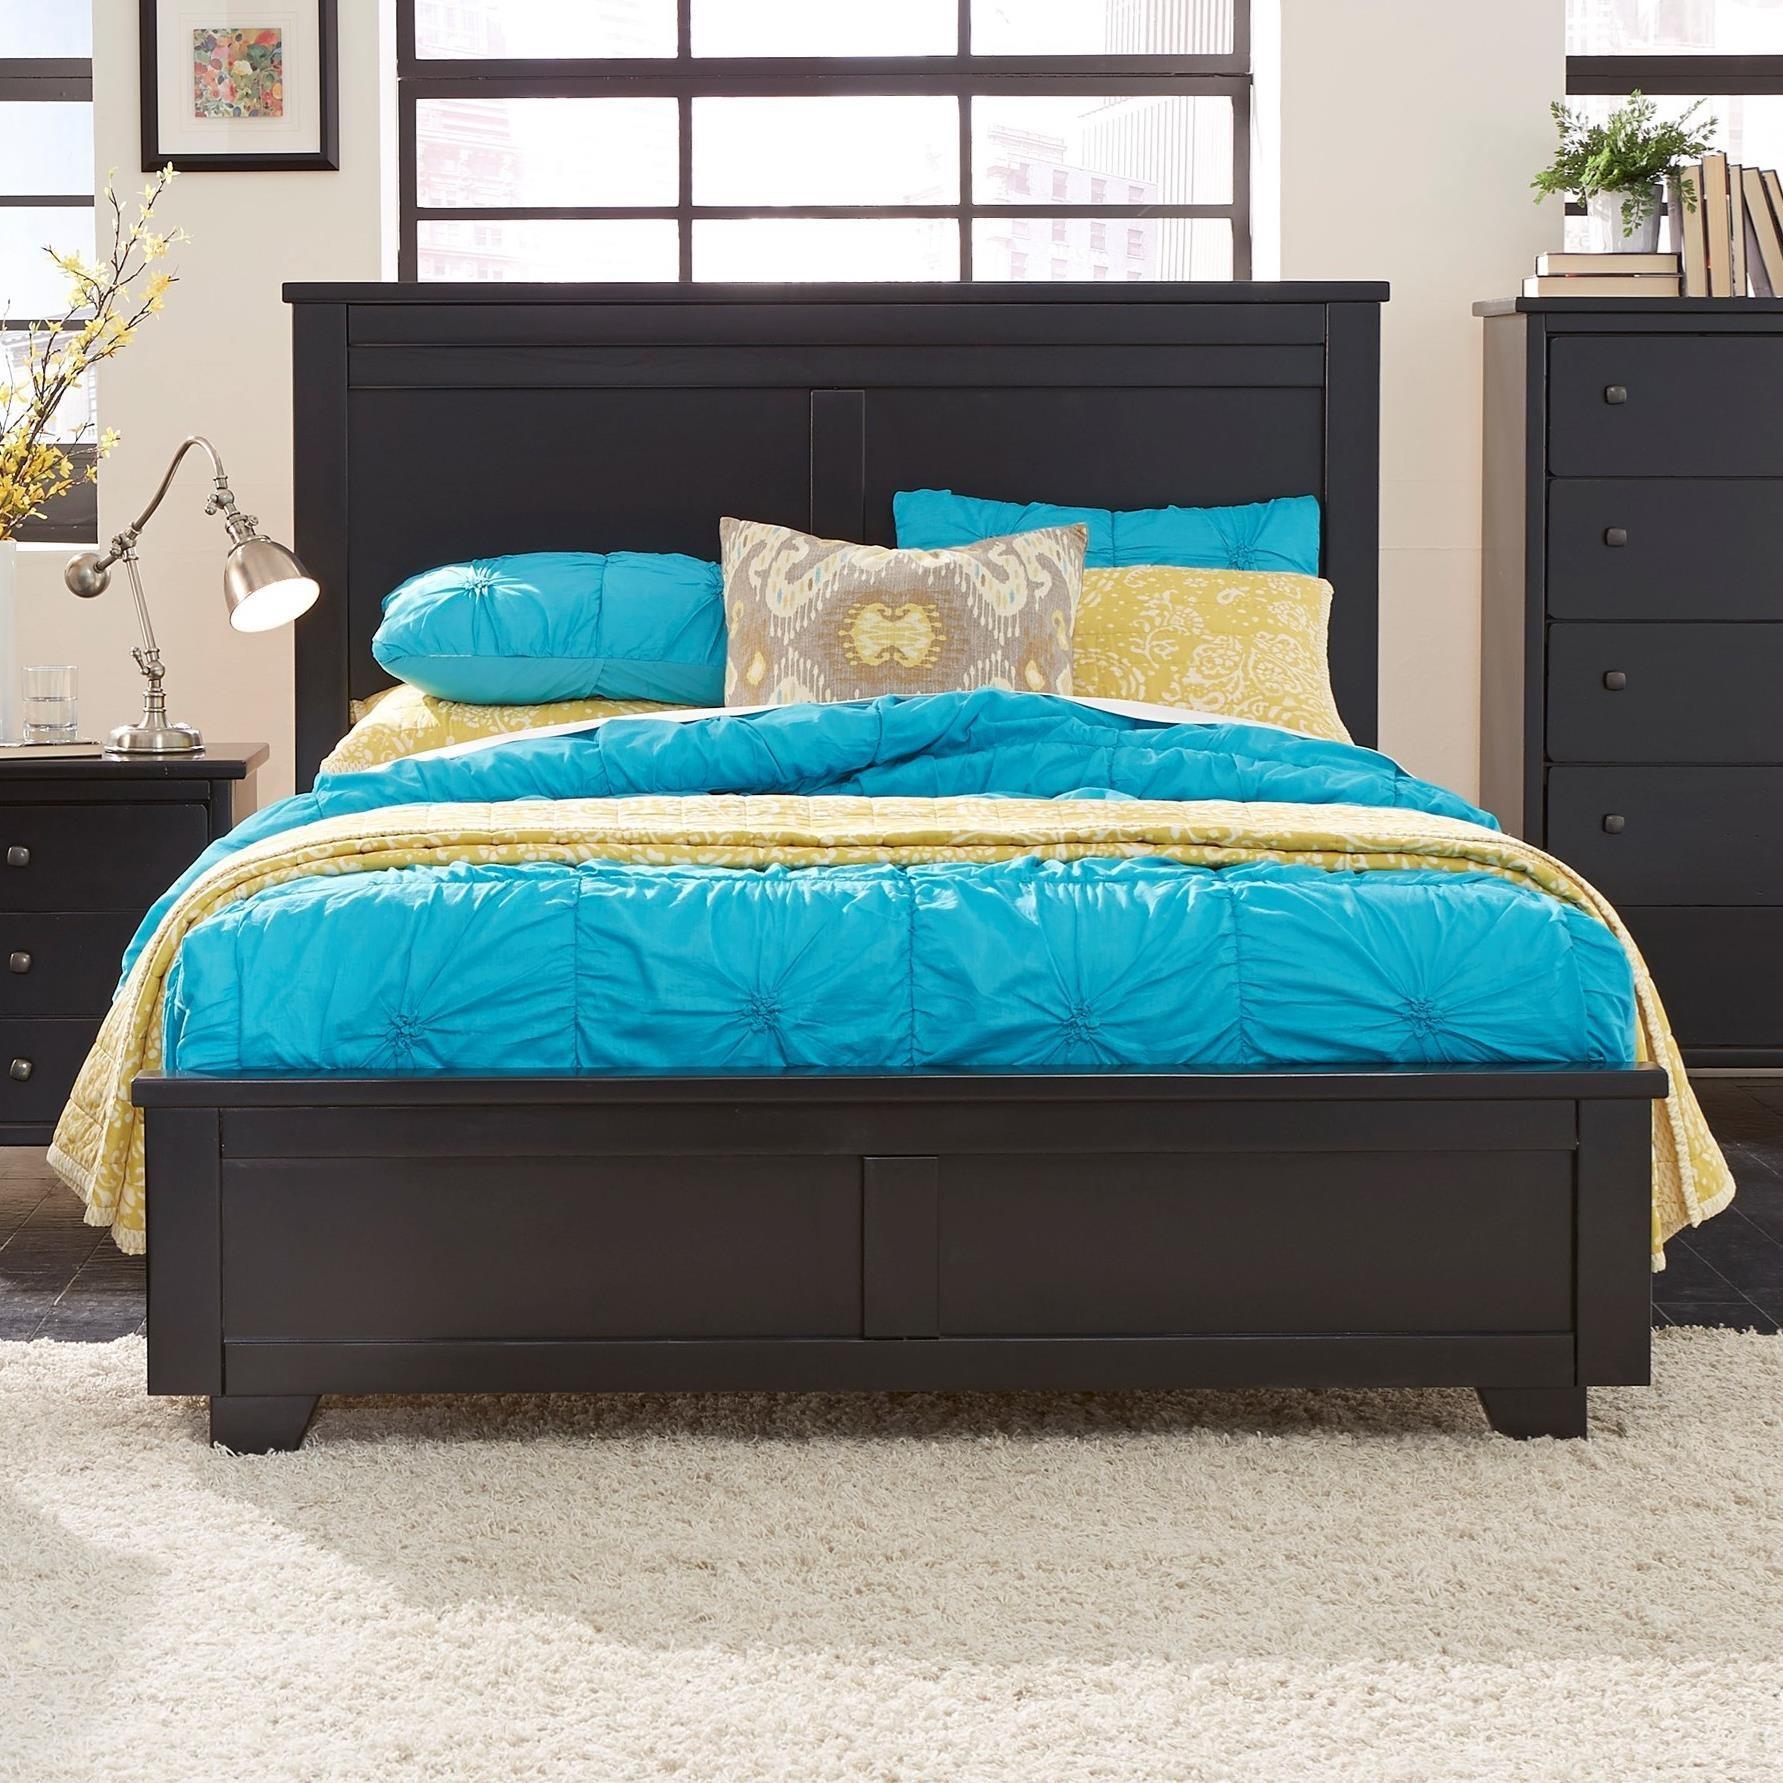 Progressive Furniture Diego King Panel Bed - Item Number: P619-94+95+97